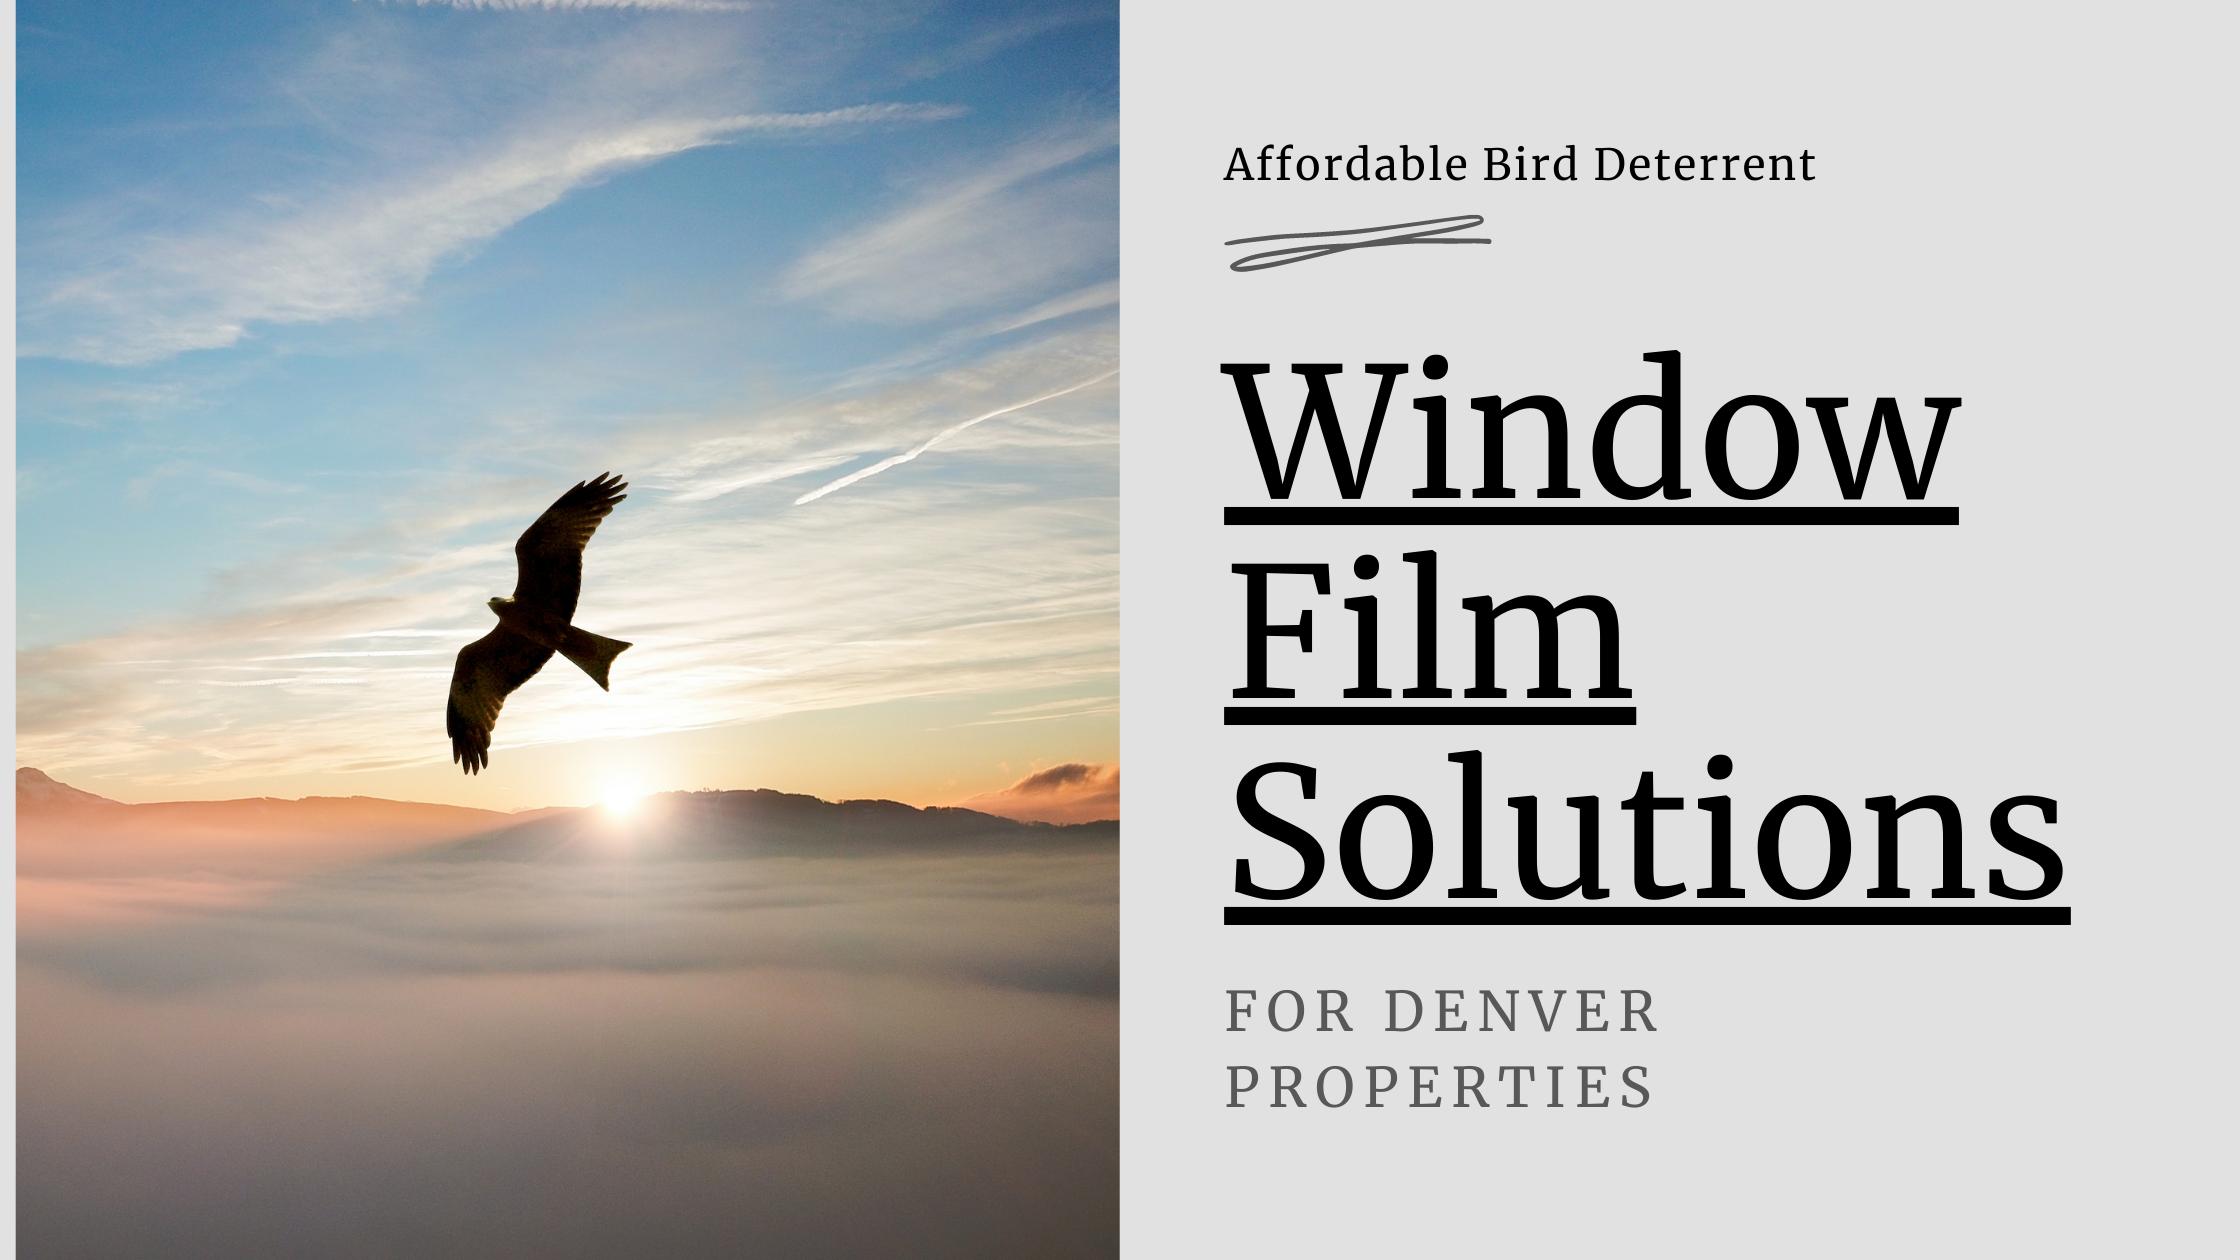 Affordable Bird Deterrent Window Film Solutions for Denver Properties